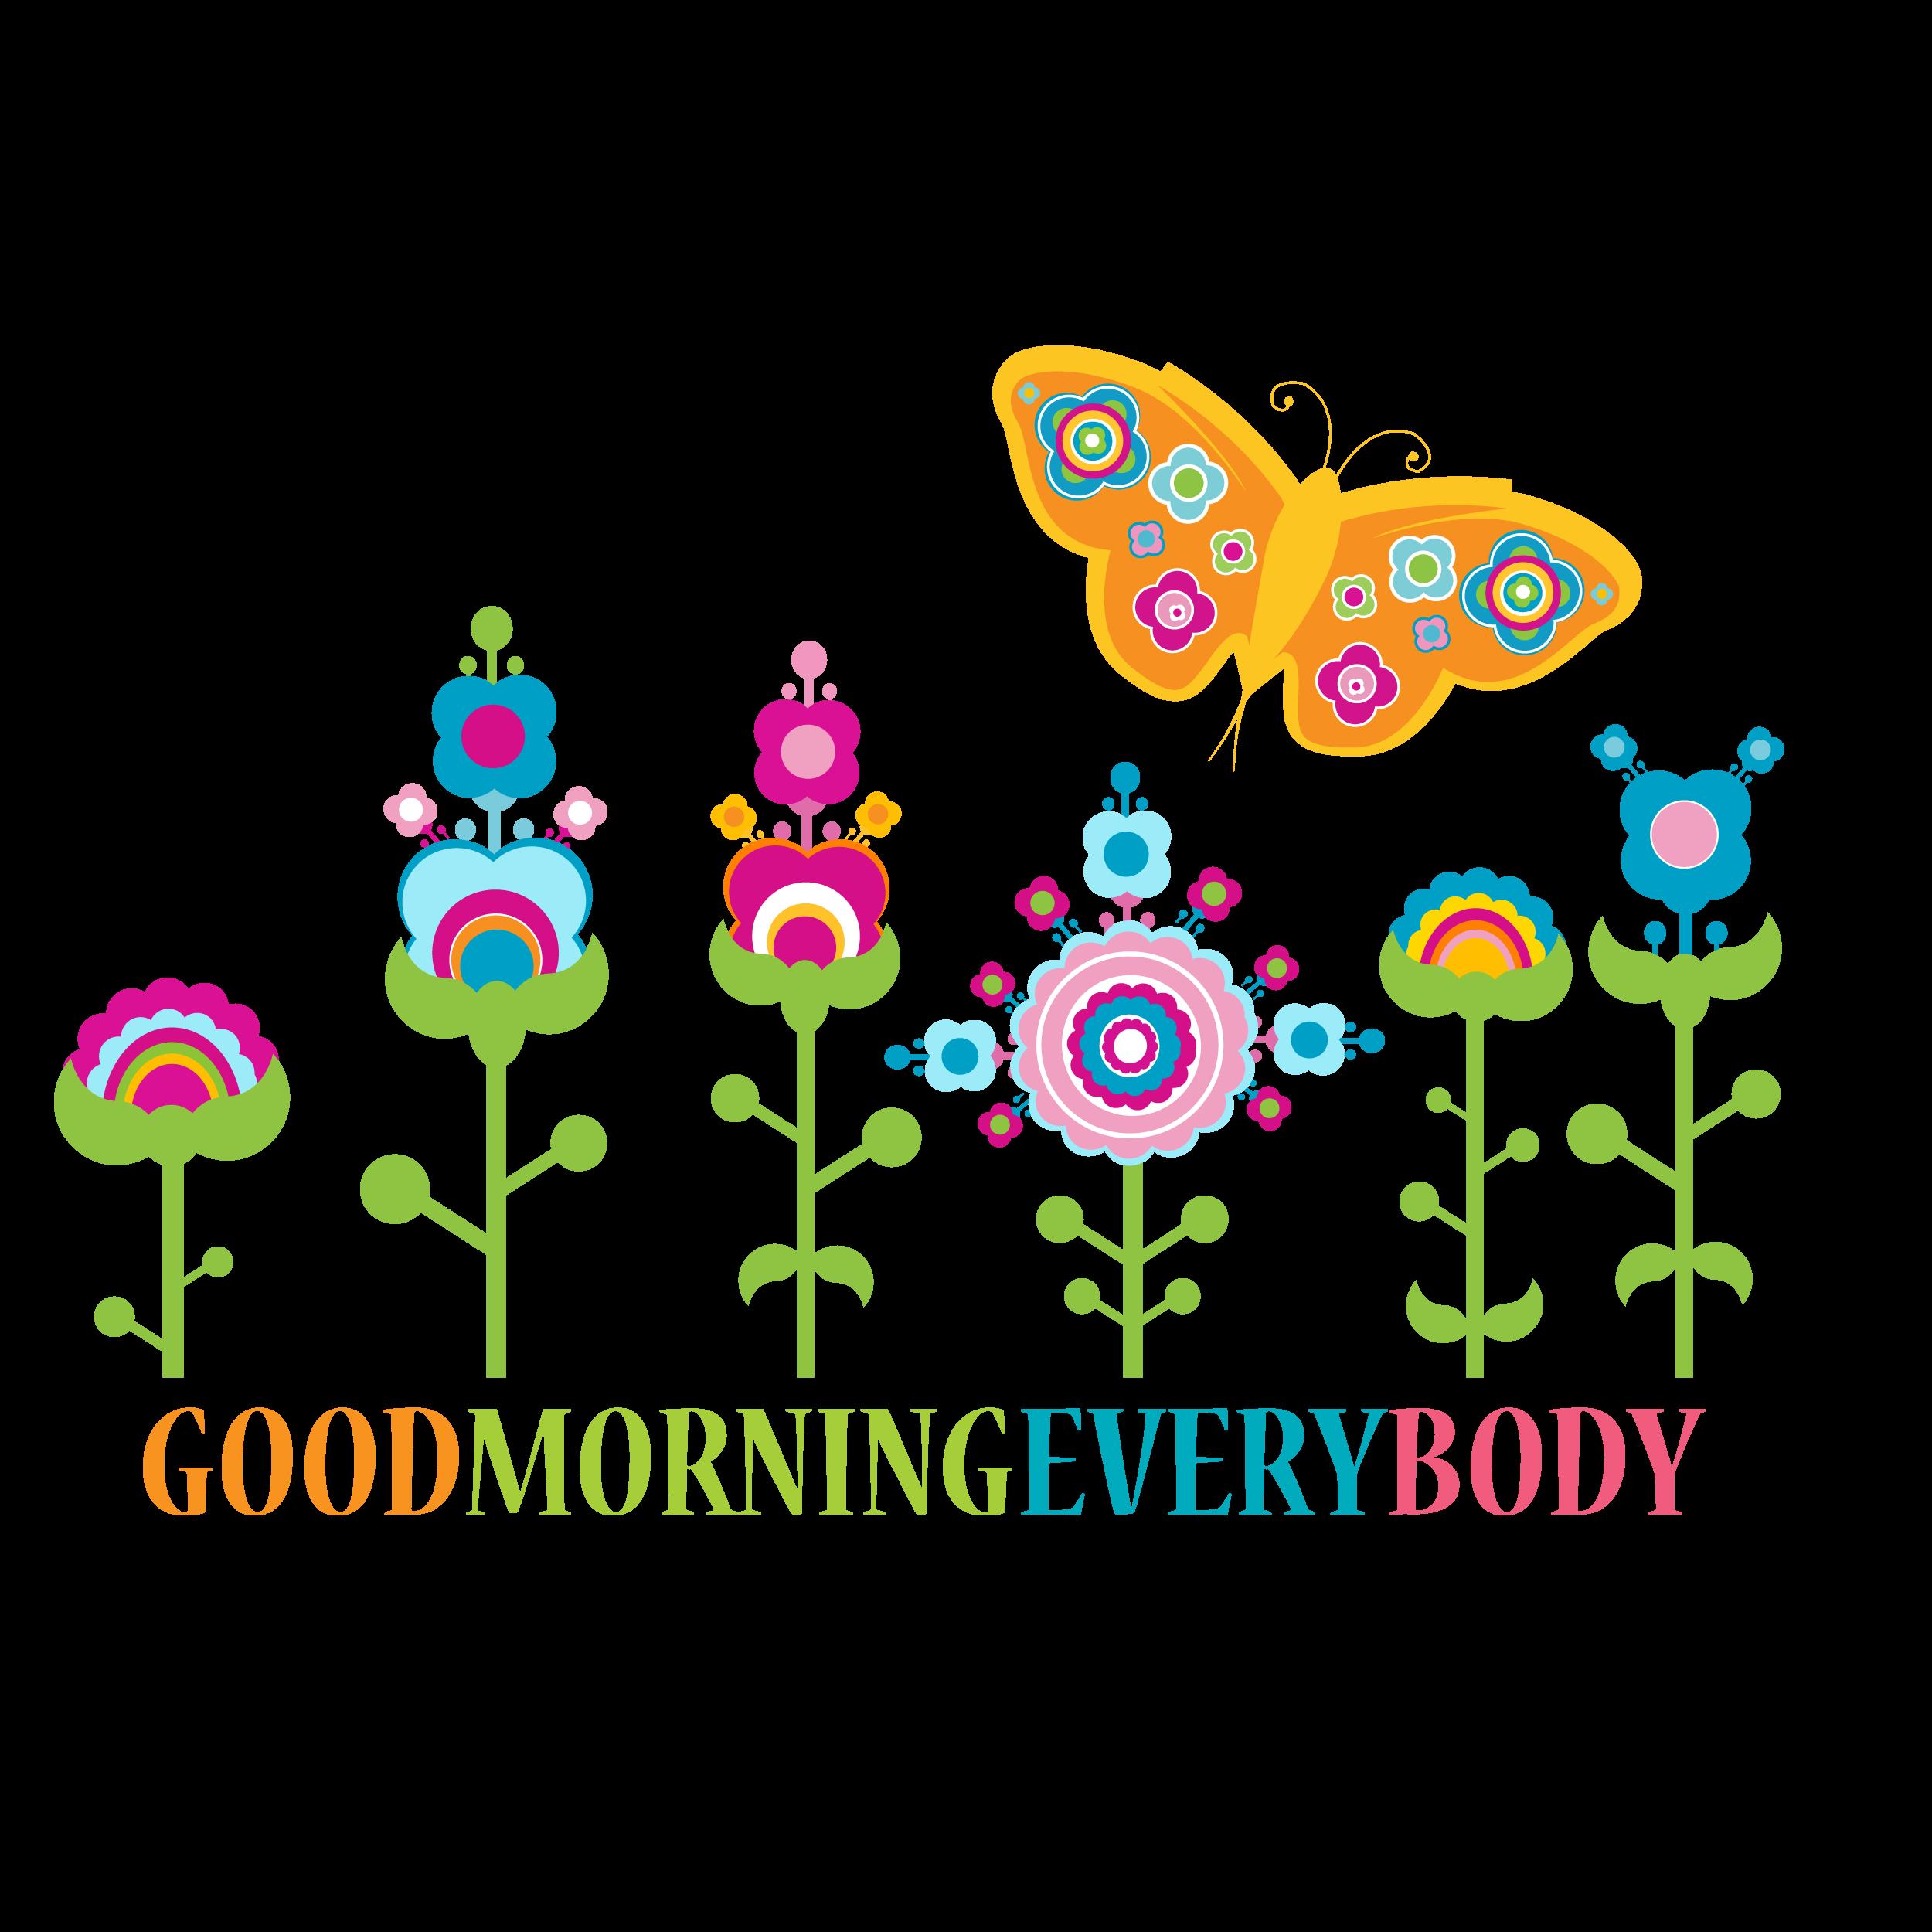 Good Morning Png Png Image - Good Morning, Transparent background PNG HD thumbnail